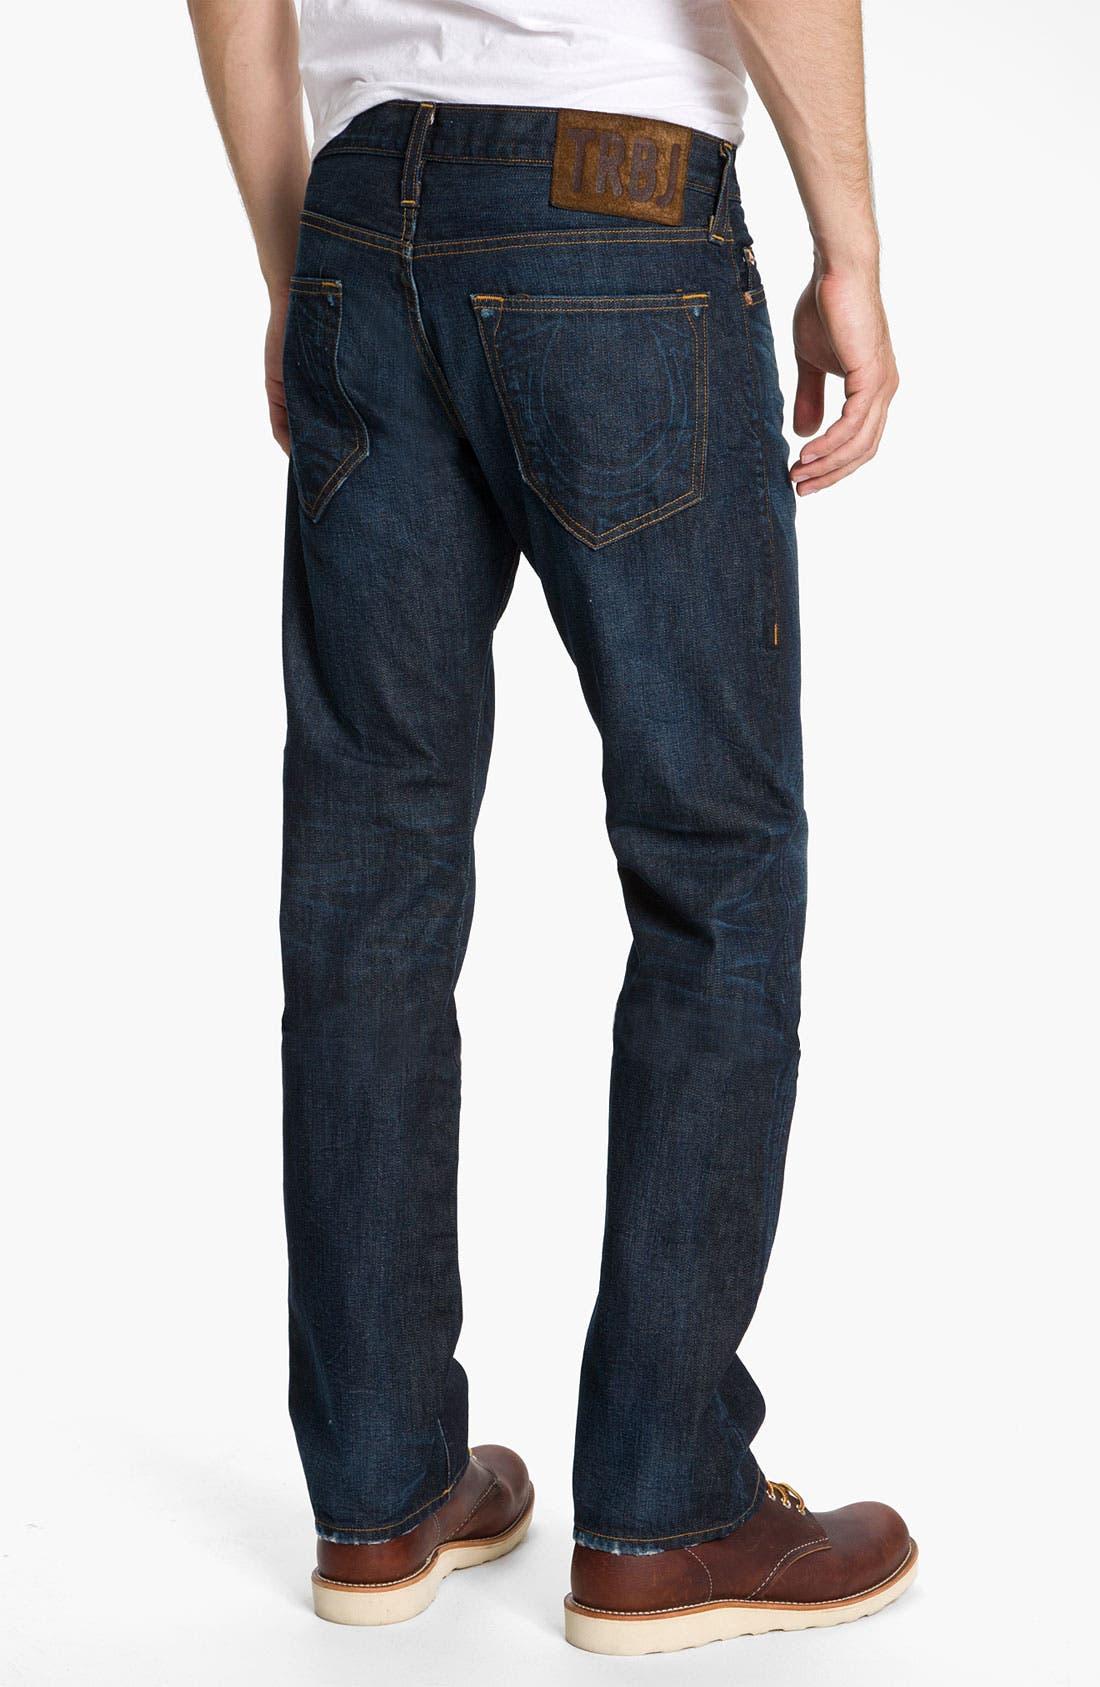 Main Image - True Religion Brand Jeans 'Bobby 1971' Straight Leg Jeans (Ransom)